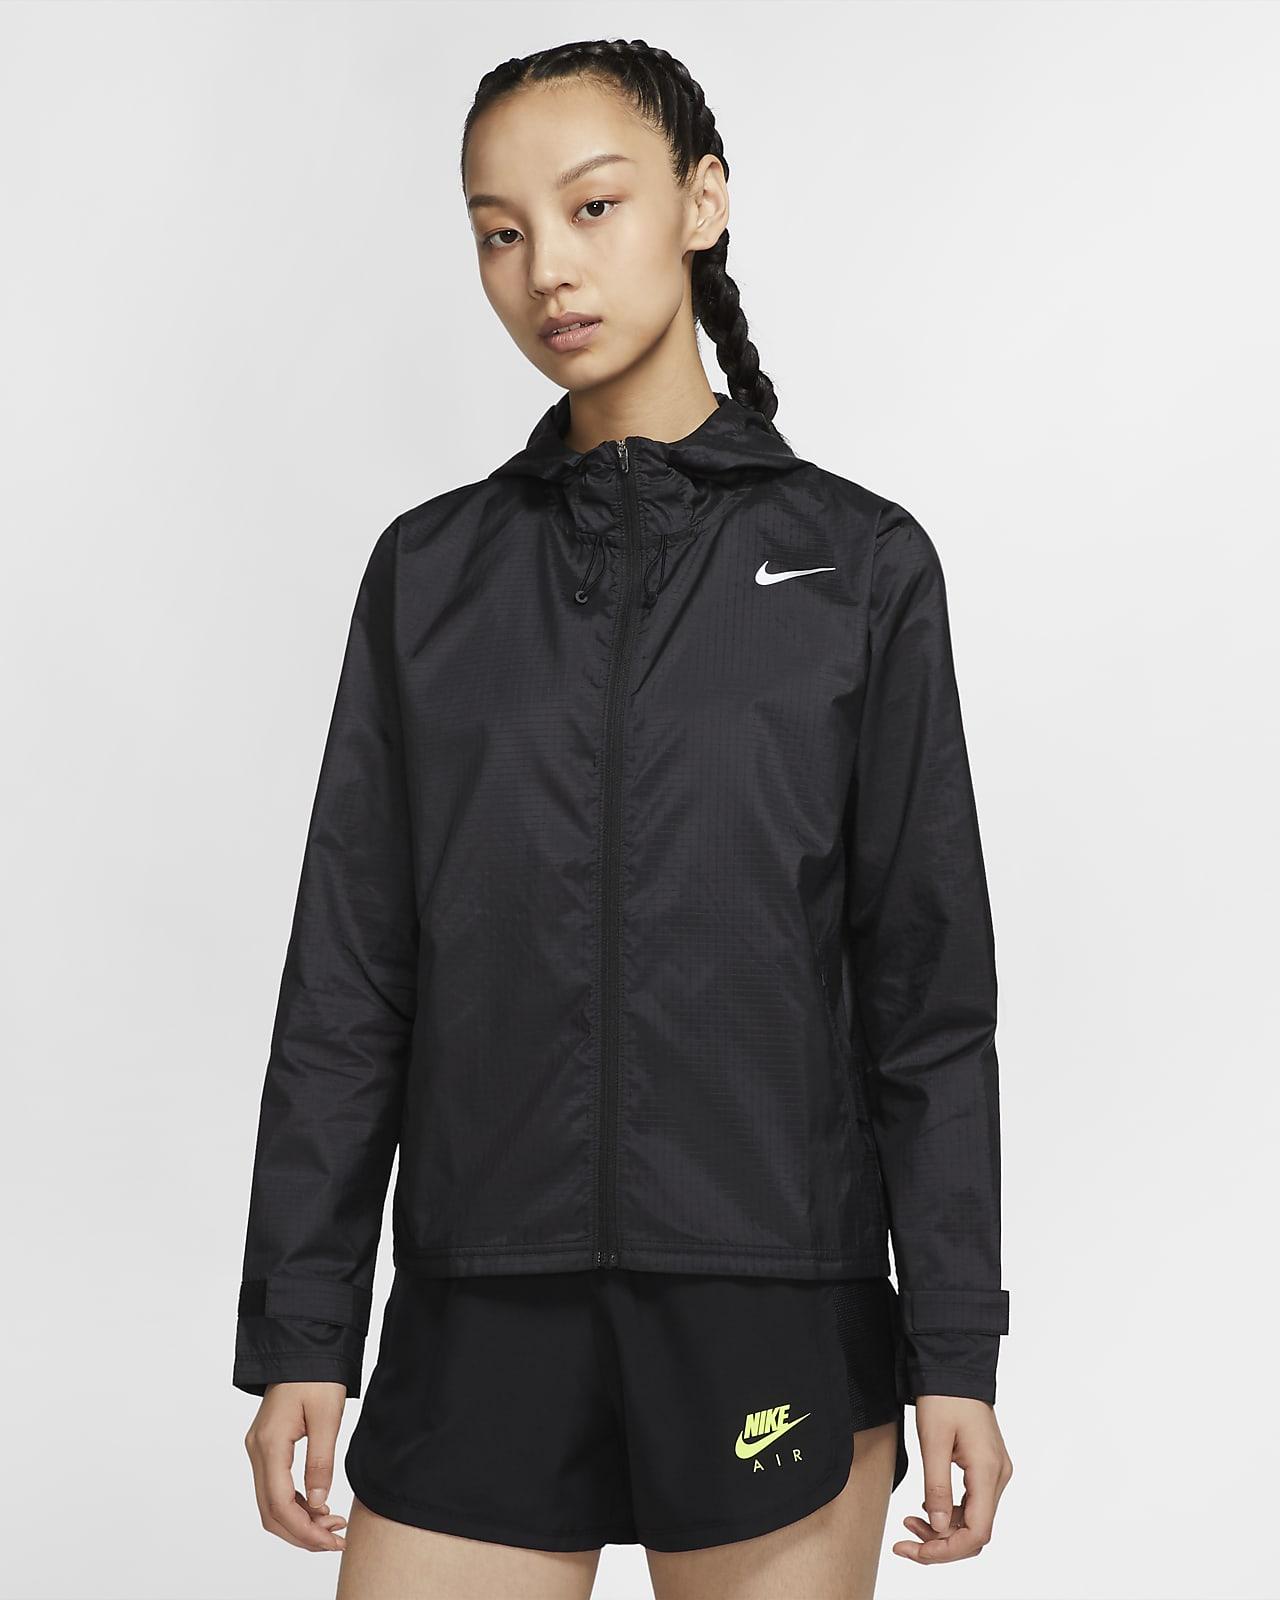 Veste de running Nike Essential pour Femme